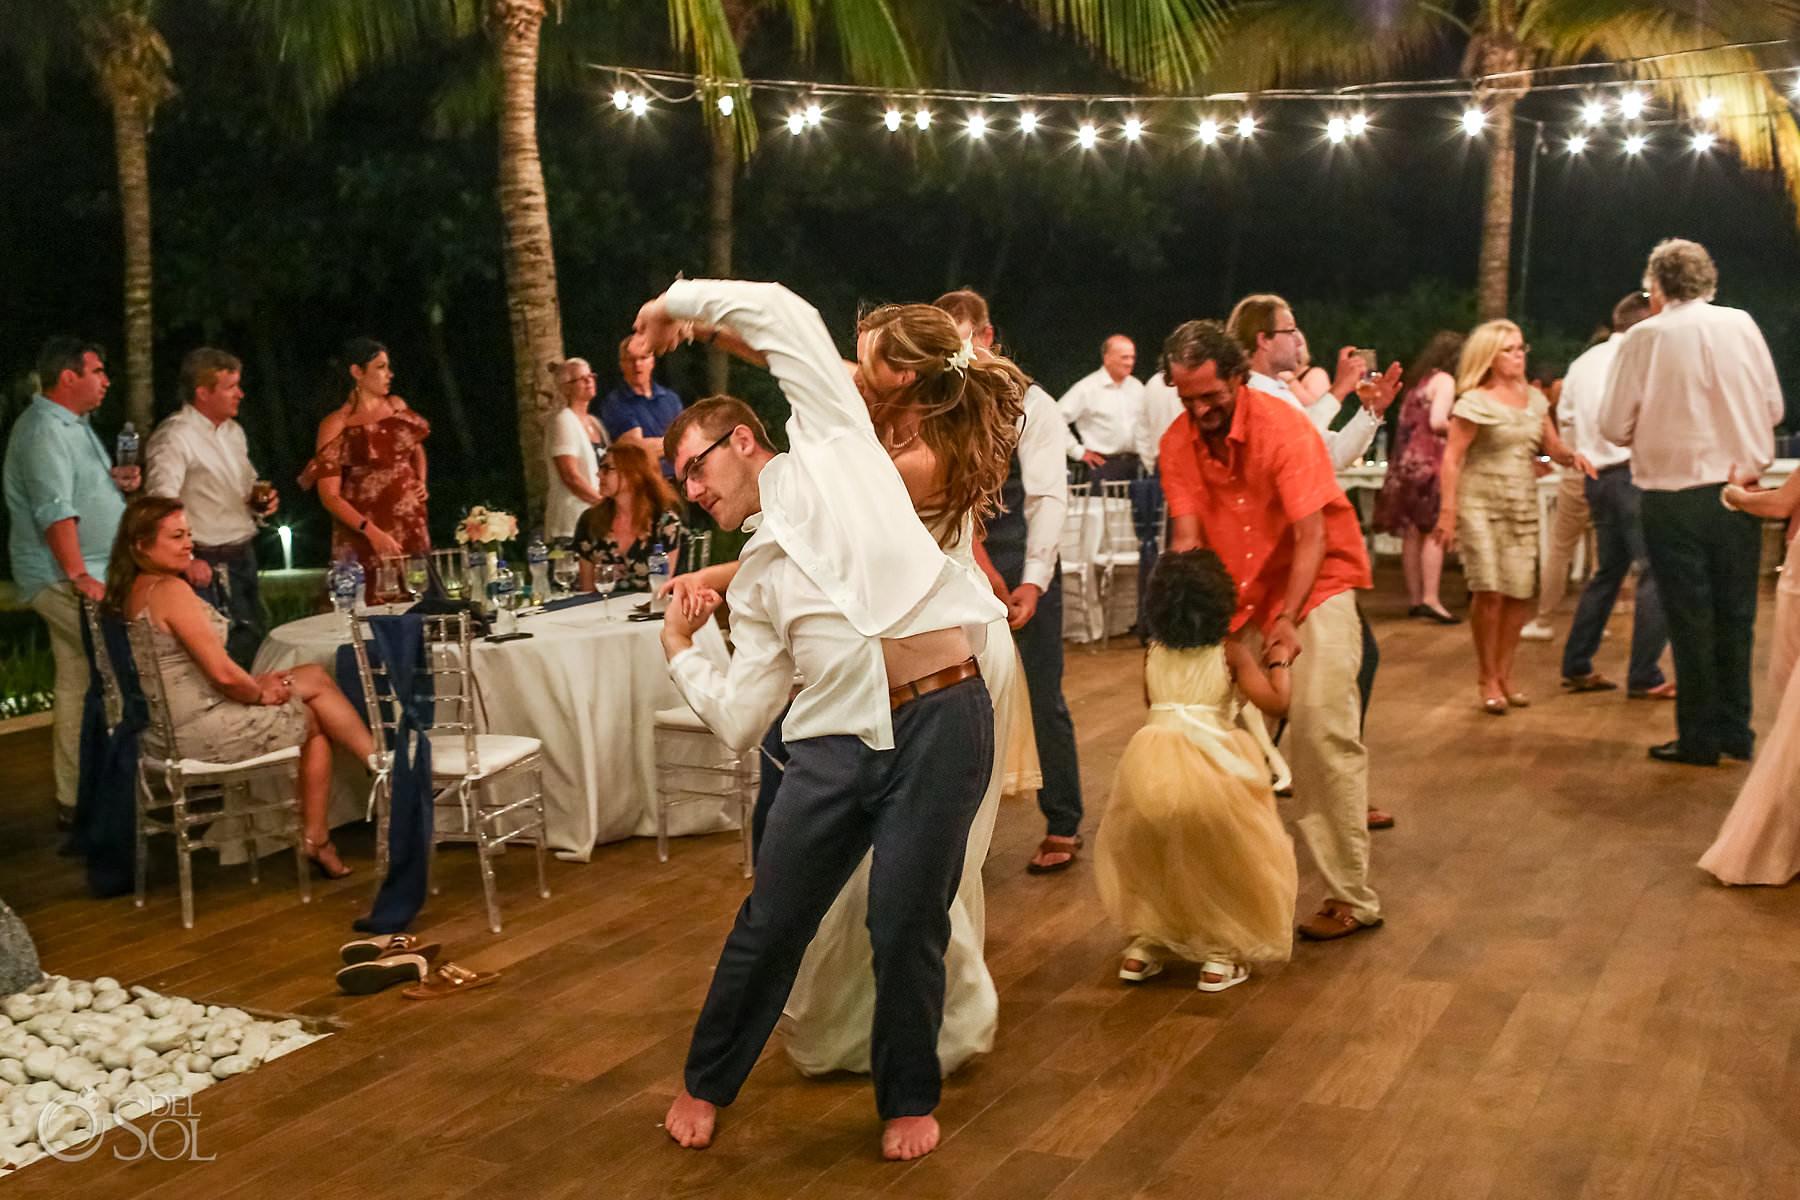 dance and fun Weddingn reception Captain Morgan Grill Riviera Maya Mexico